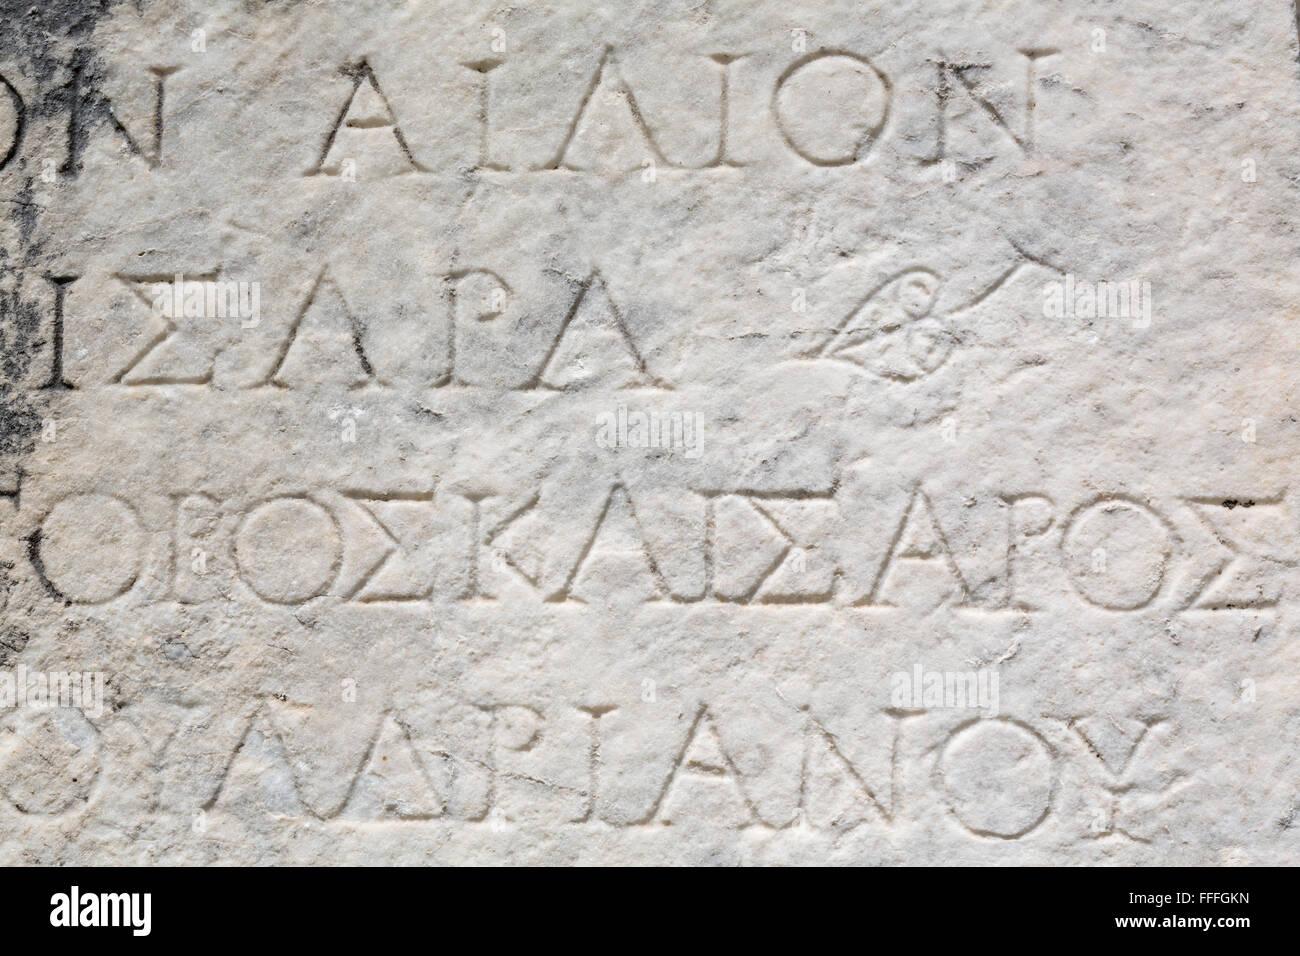 Ancient inscription in Greek language, Pergamon, Bergama, Izmir Province, Turkey - Stock Image